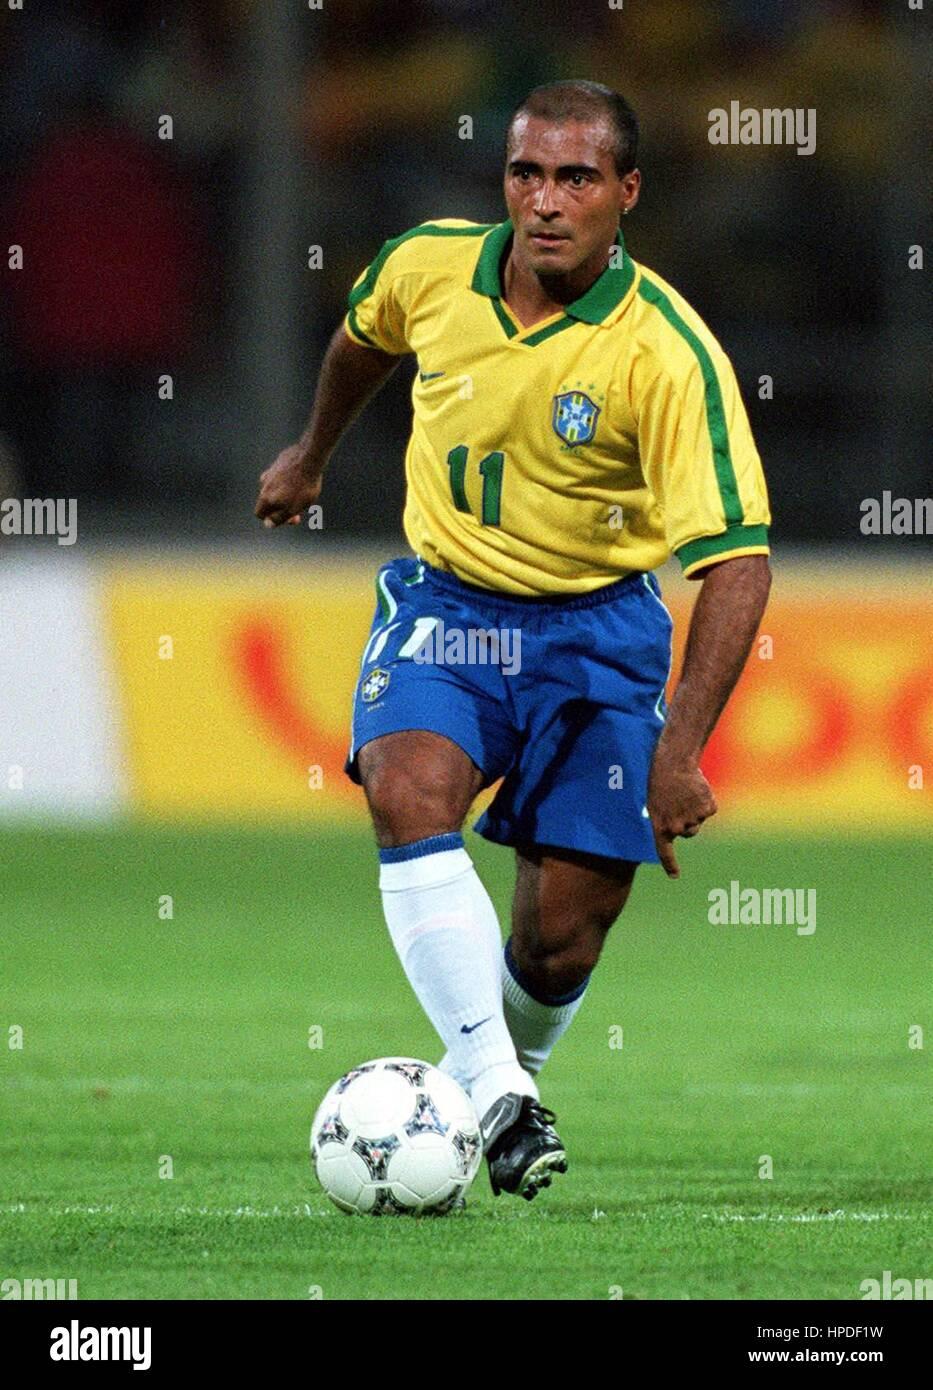 ROMARIO BRAZIL & FLAMENGO 11 June 1997 Stock Royalty Free